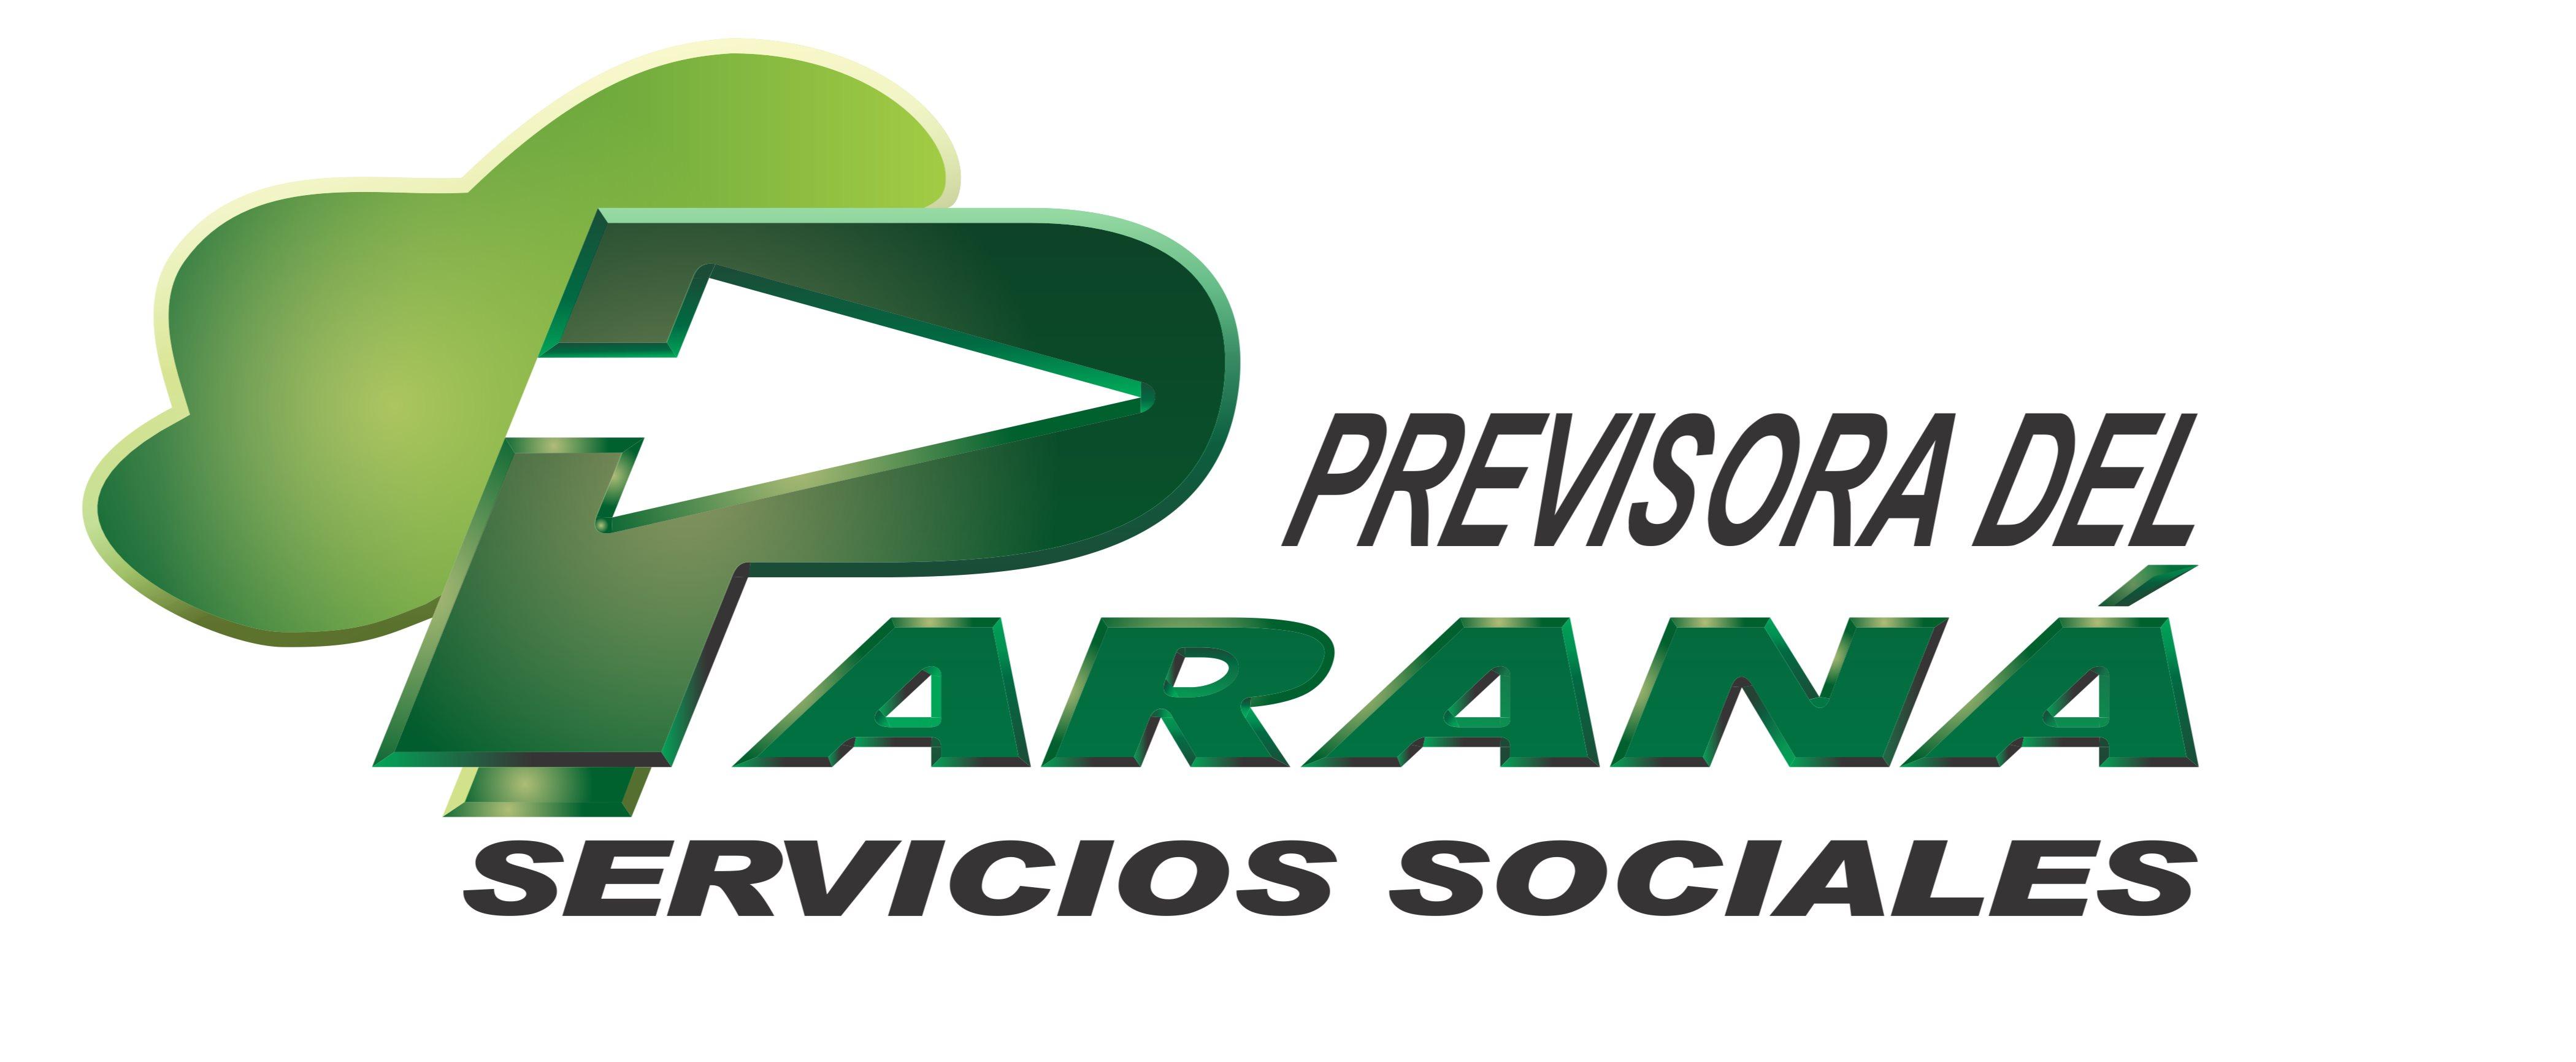 Previsora del Paraná S.R.L.